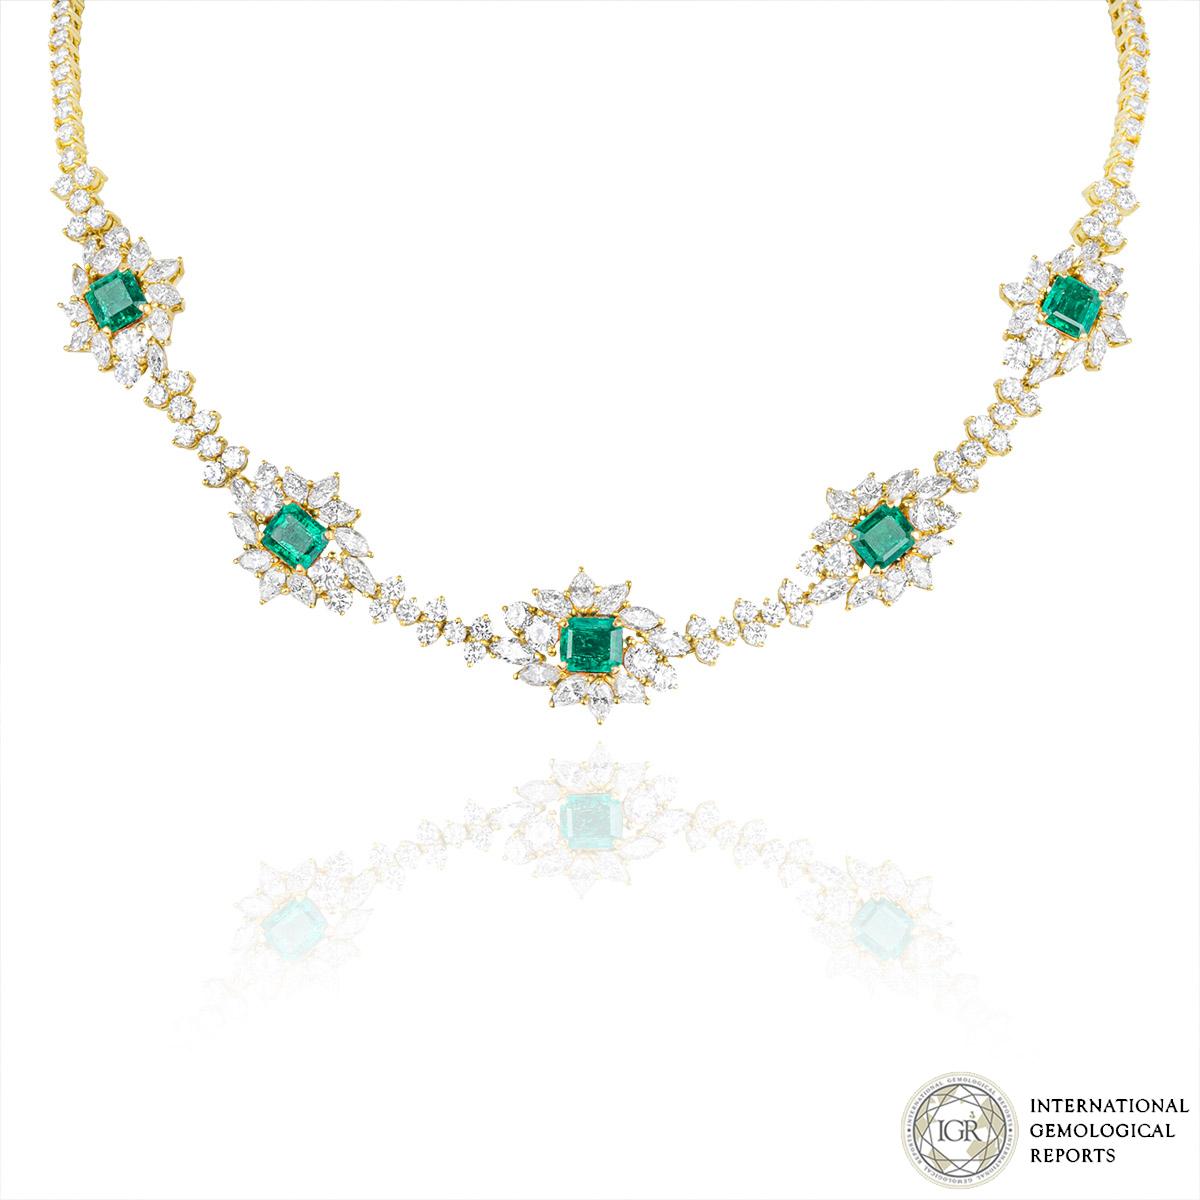 ef76178e87cda9 Yellow Gold Diamond and Emerald Necklace